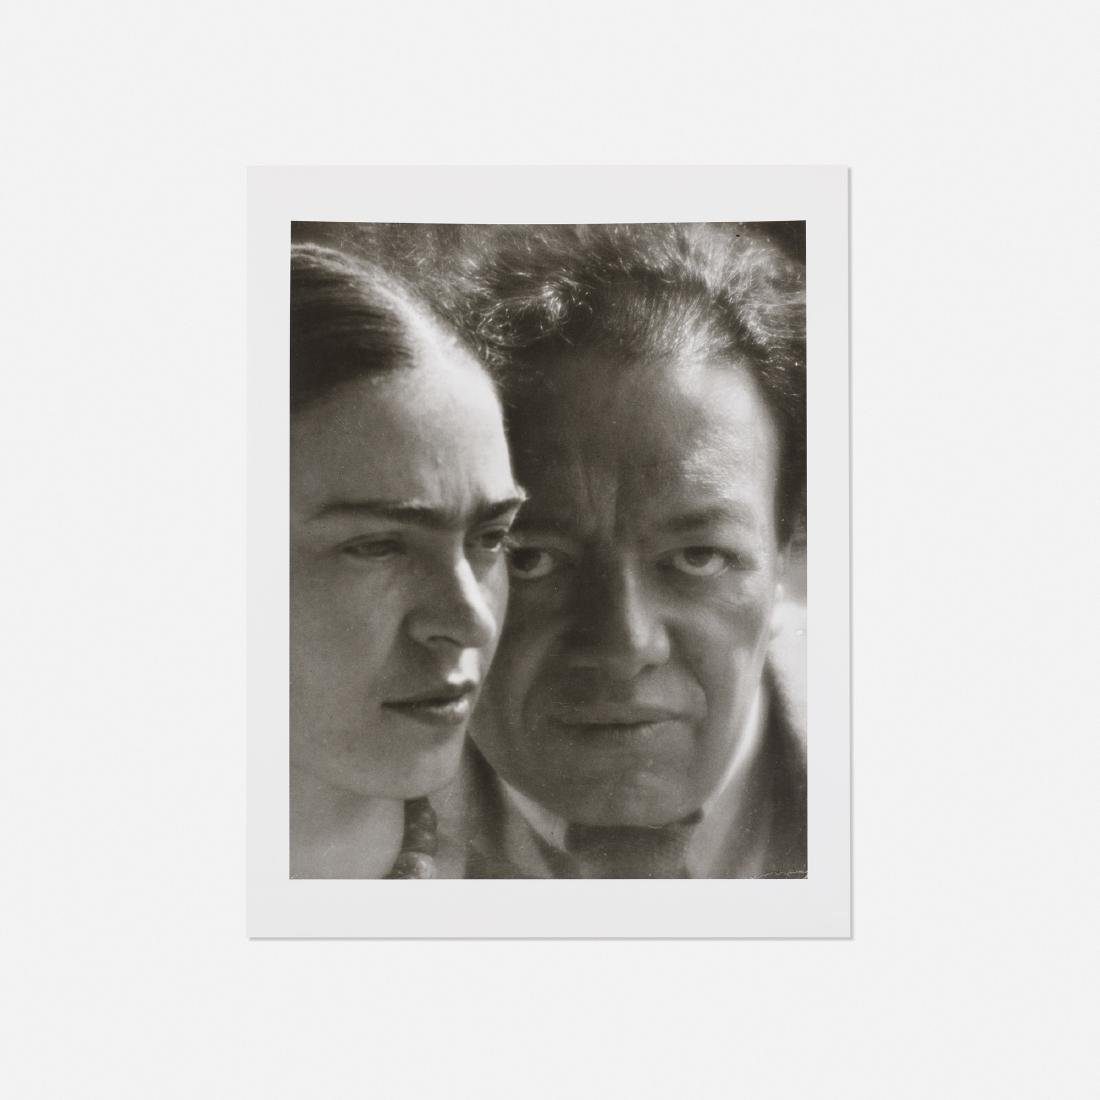 Martin Munkacsi, Frida Kahlo and Diego Rivera